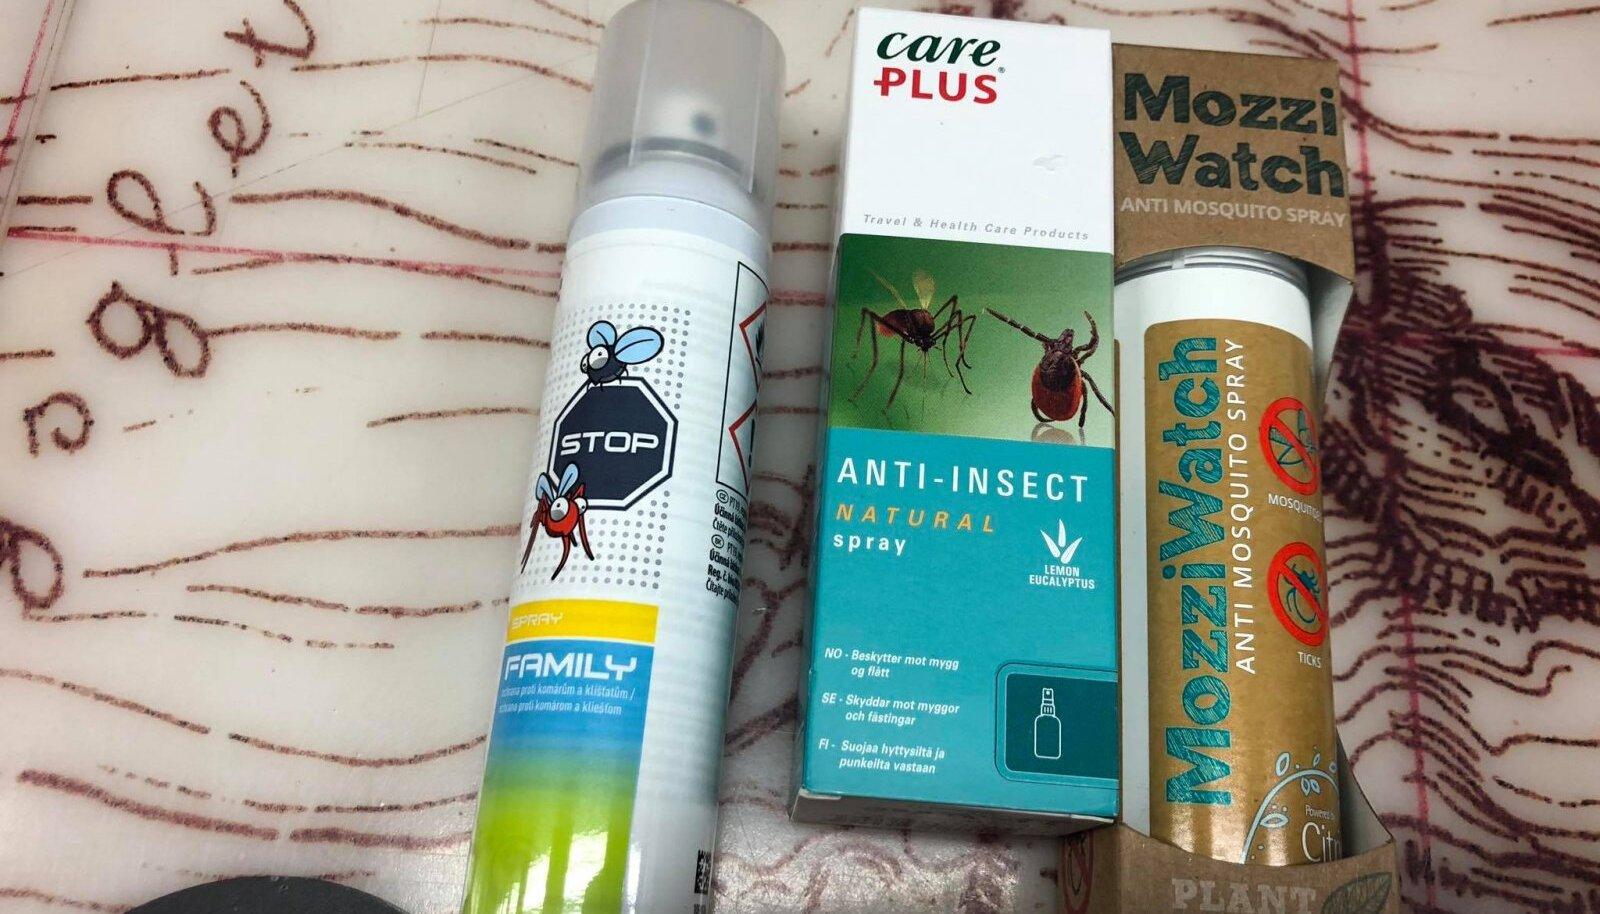 Putukatõrjed